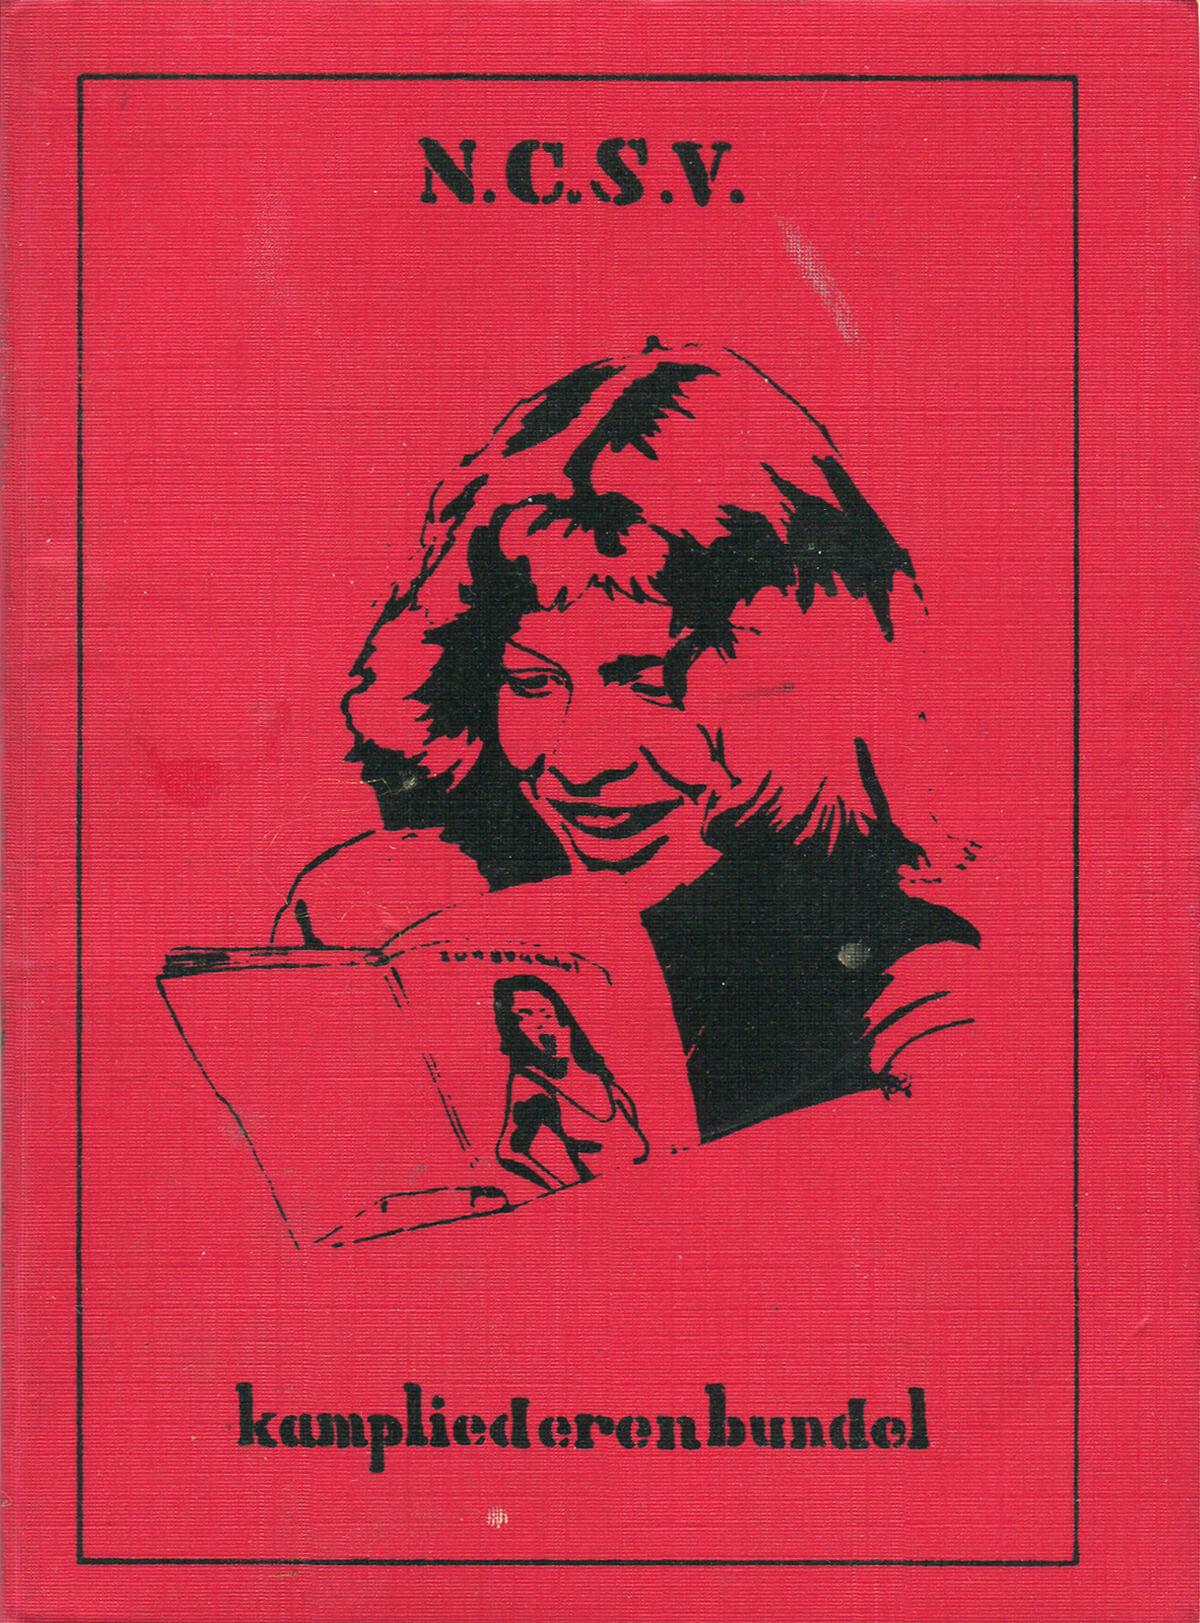 NCSV Kampliederenbundel, cover, 14.1 x 10.3 cm, 1990